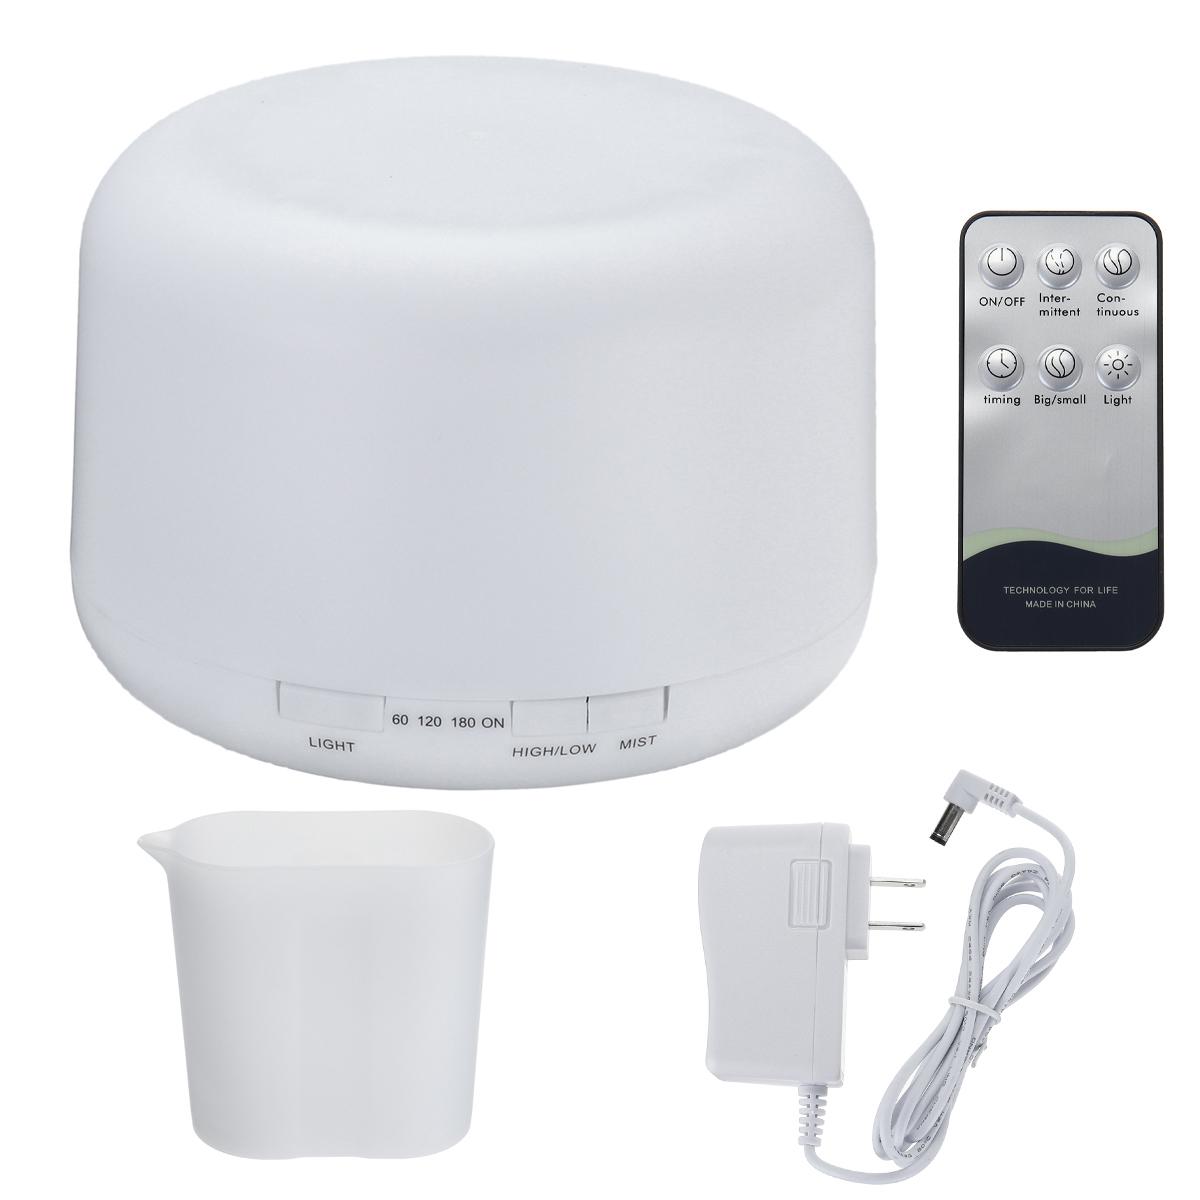 Ultrasonic Humidifier Essential Oil Diffuser Air Purifier+Remote Control 500ML